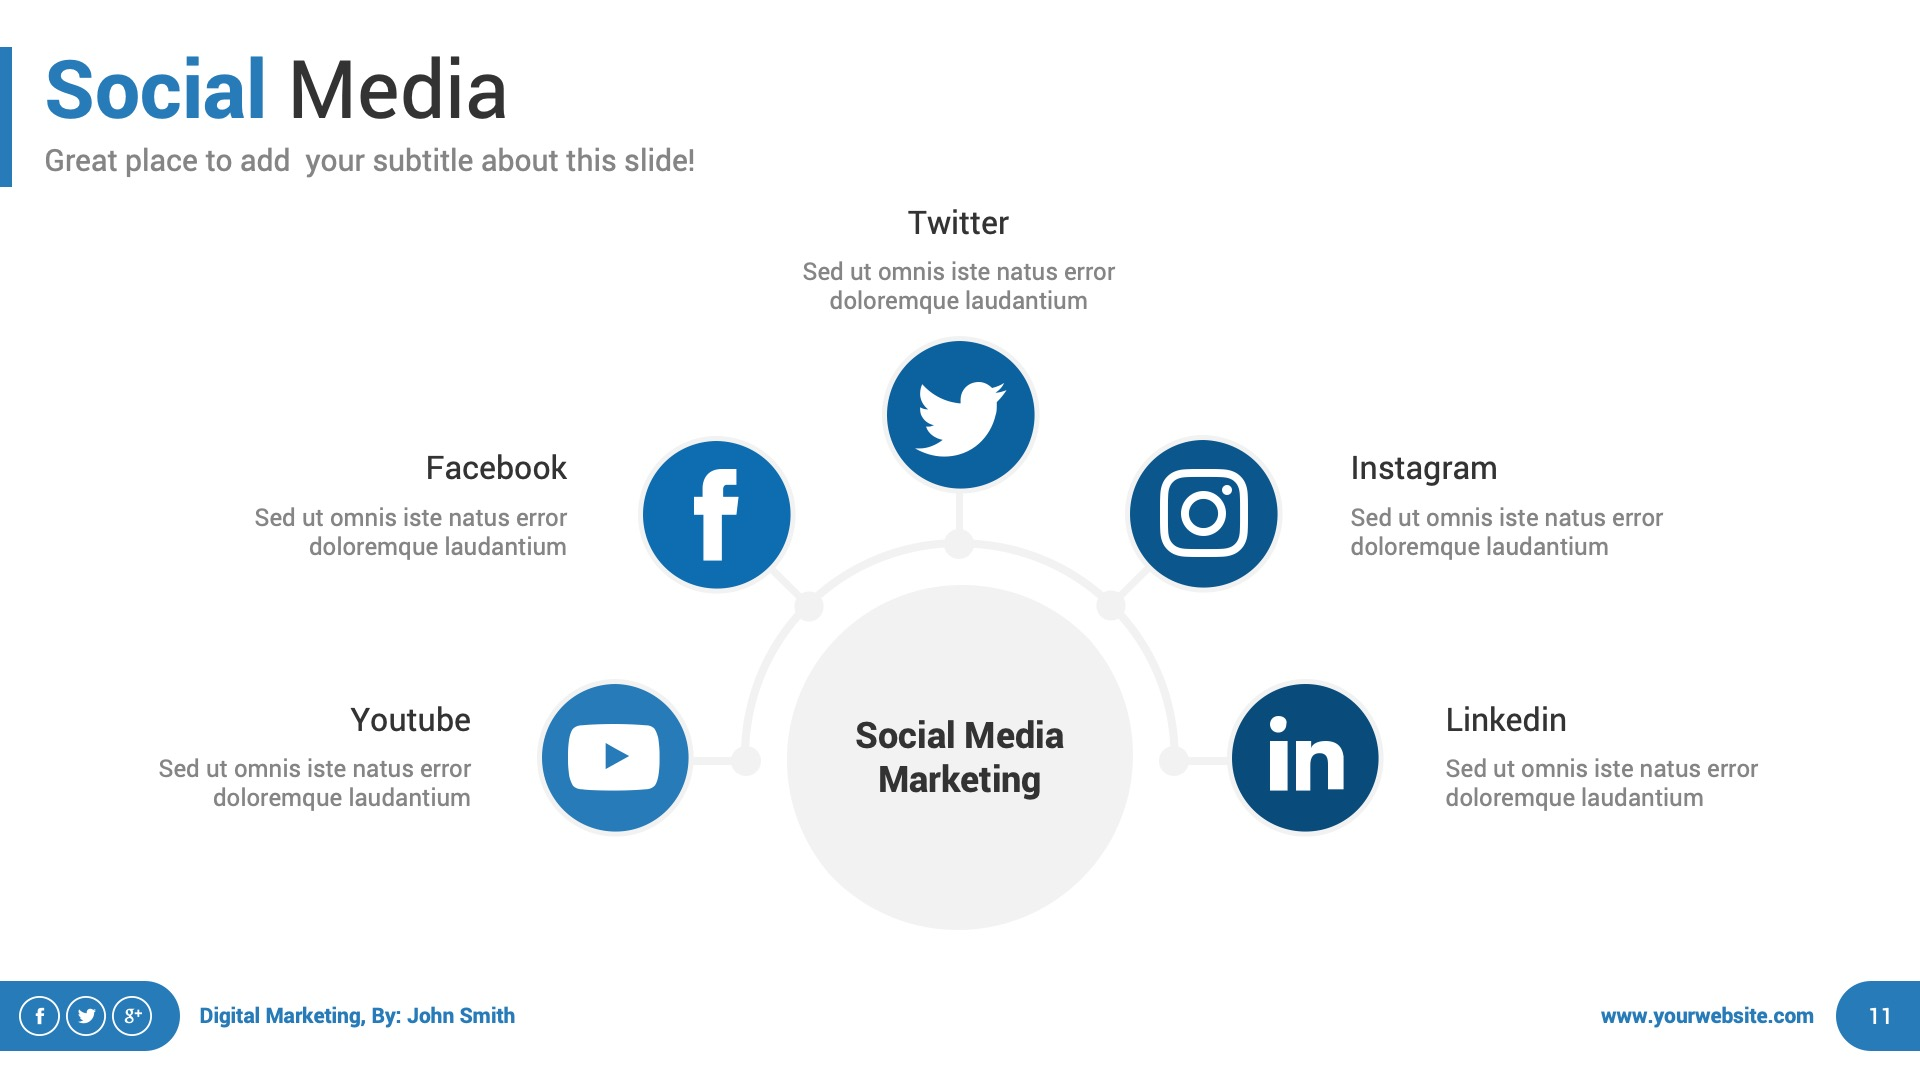 Digital Marketing and Social Media 2 PowerPoint Presentation Template